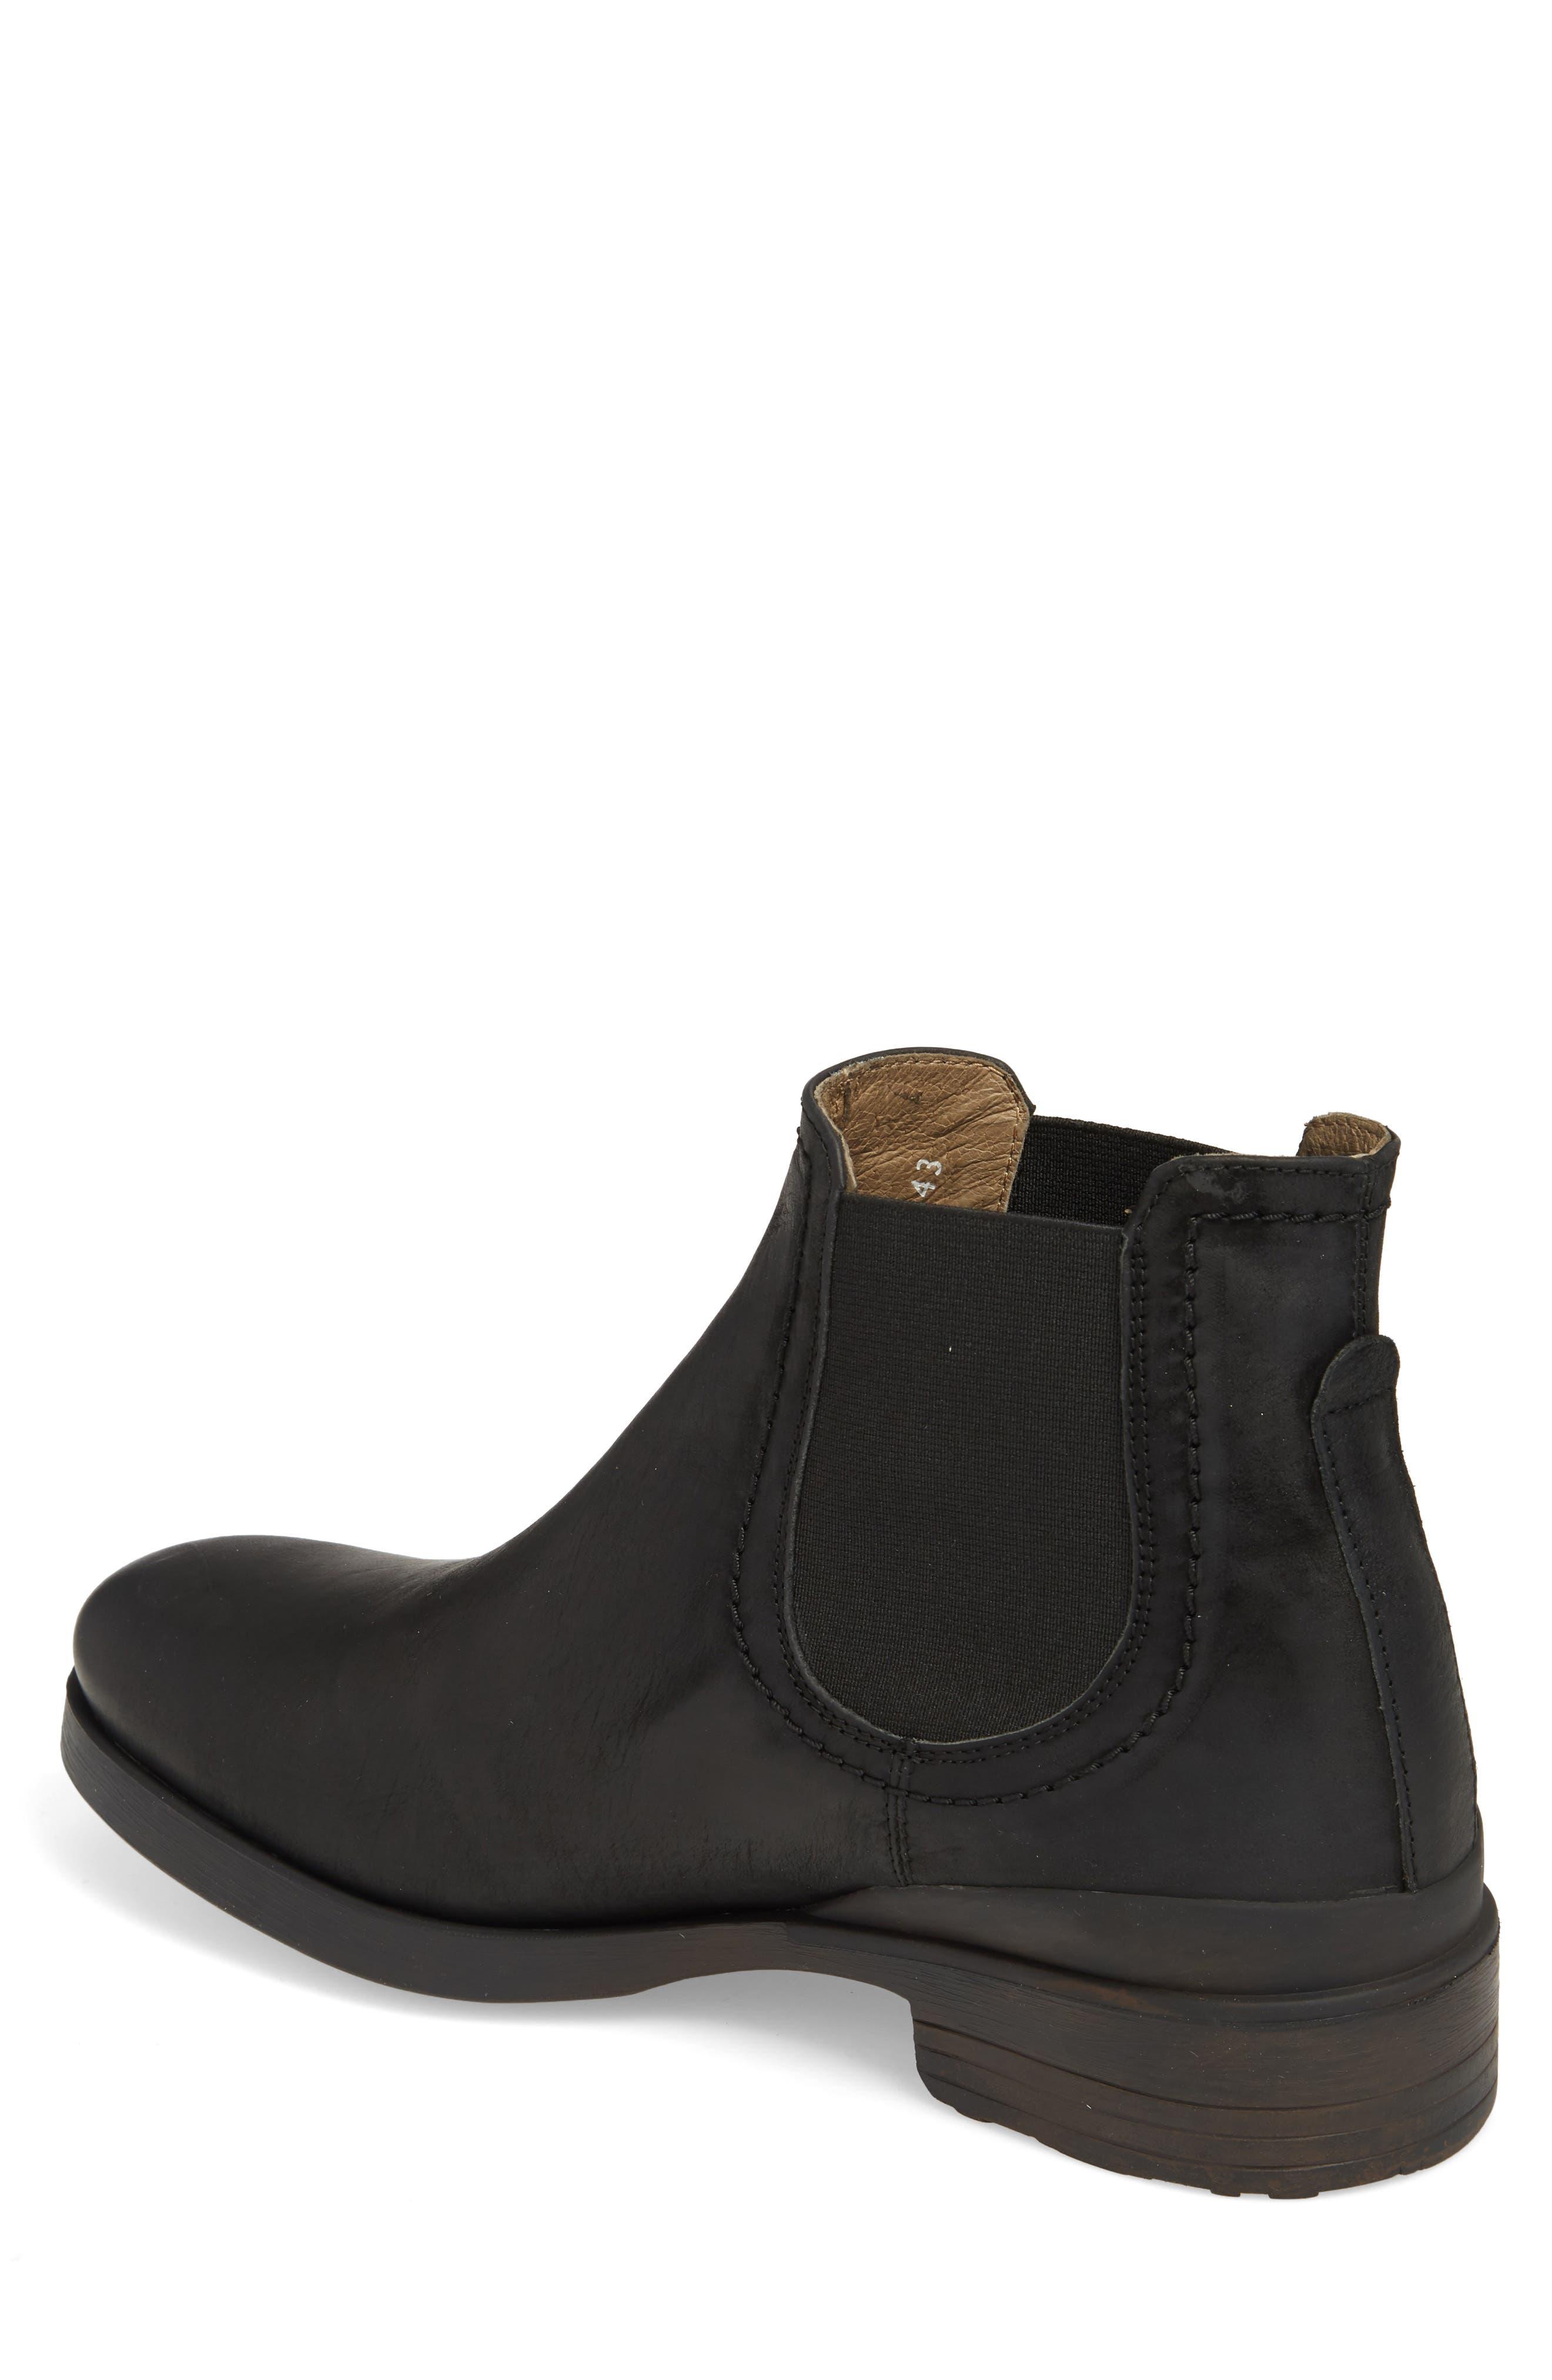 Meko Chelsea Boot,                             Alternate thumbnail 2, color,                             BLACK BANDOLERO